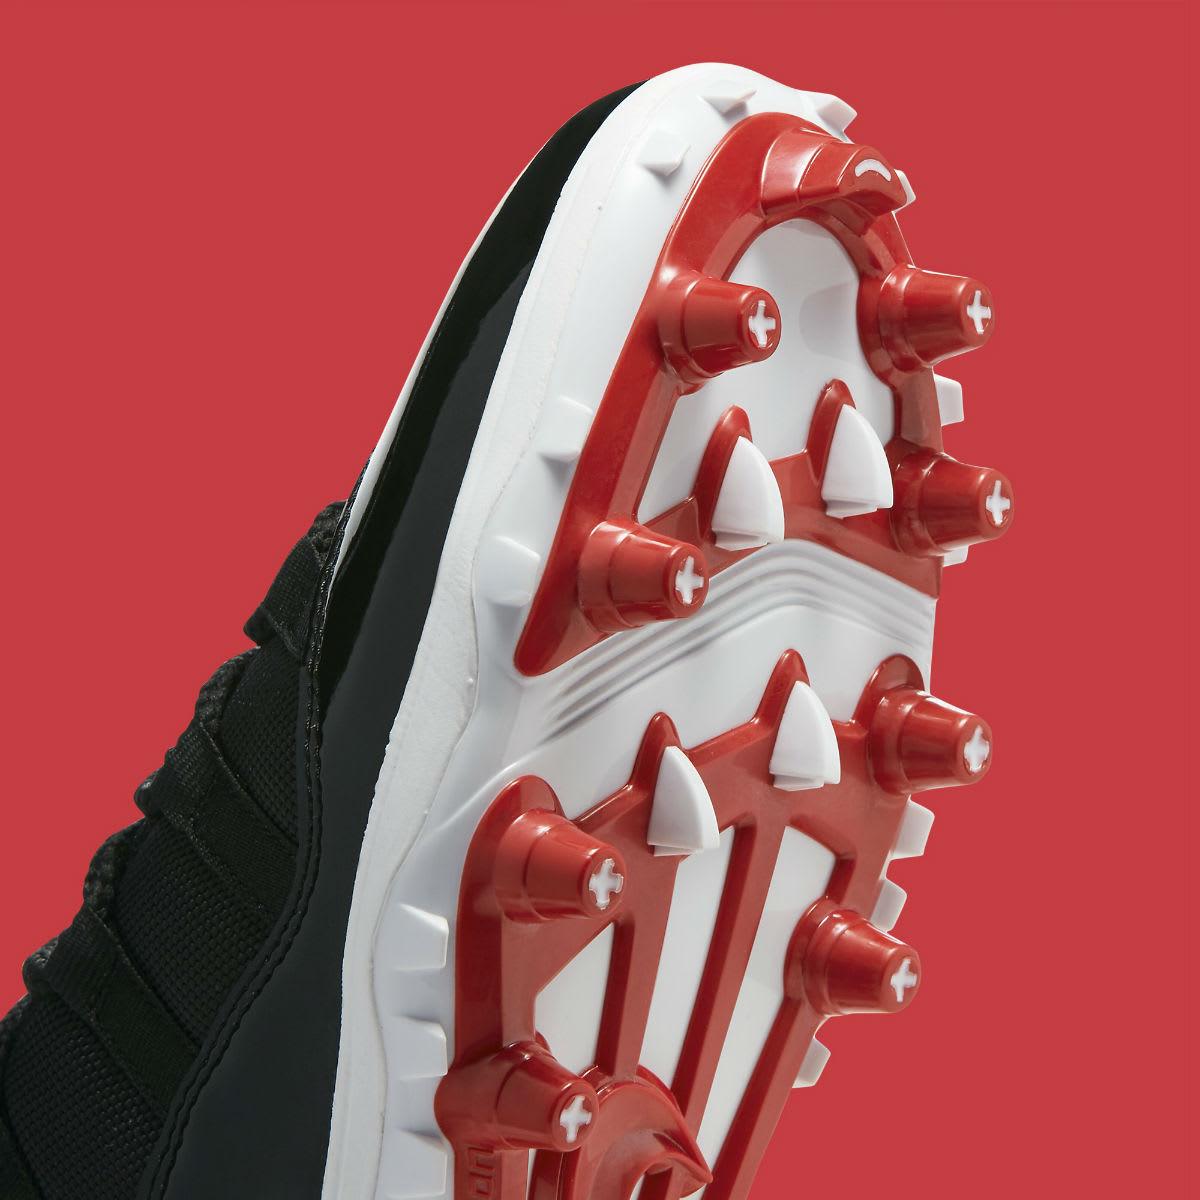 Air Jordan 11 XI Cleats Bred Release Date AO1561-010 Plate